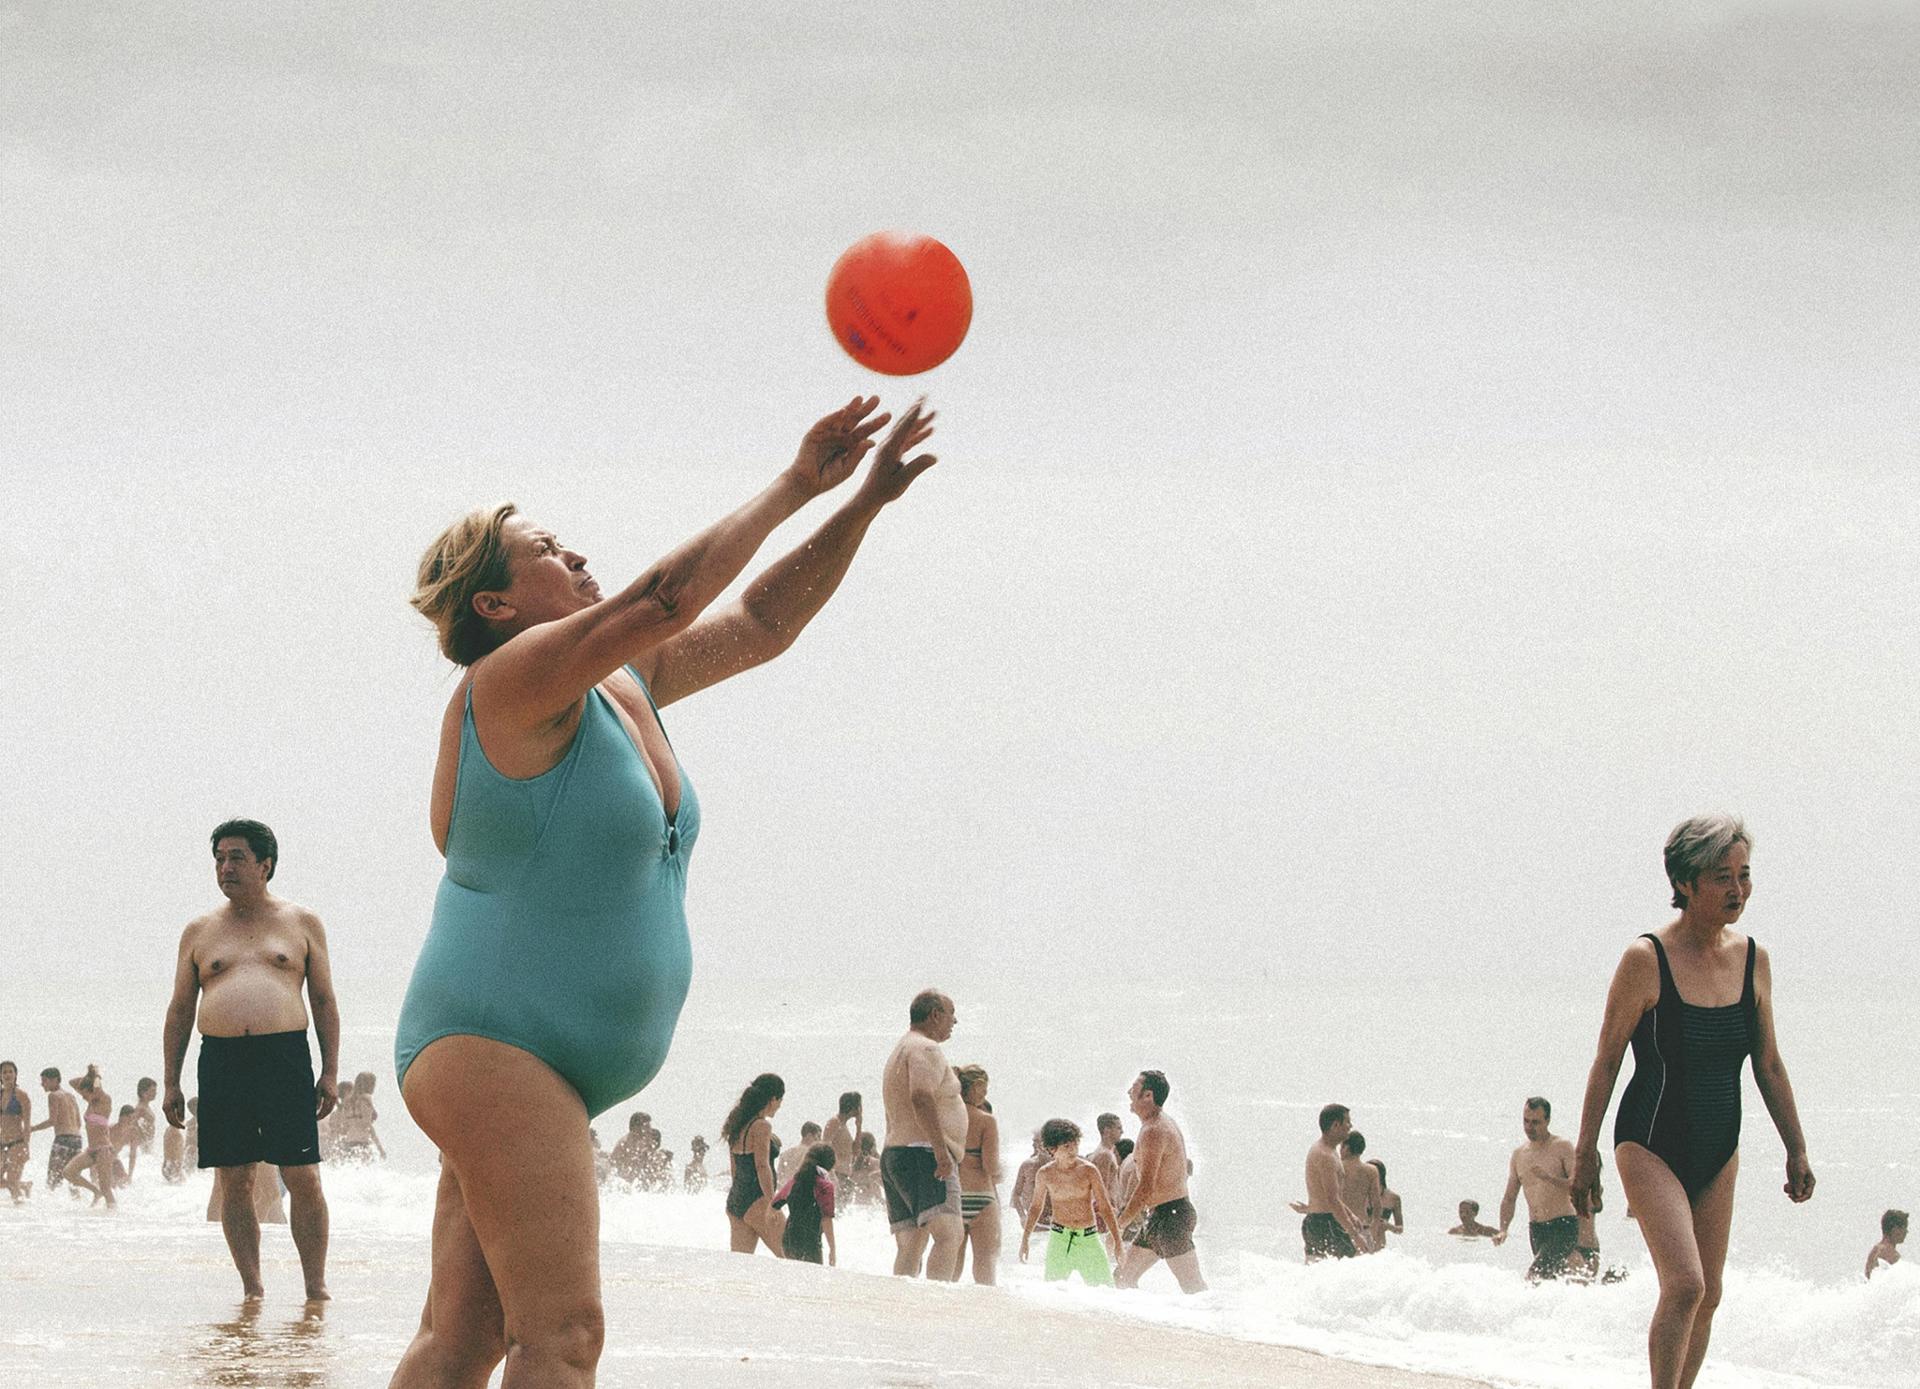 La dame qui joue au Ballon